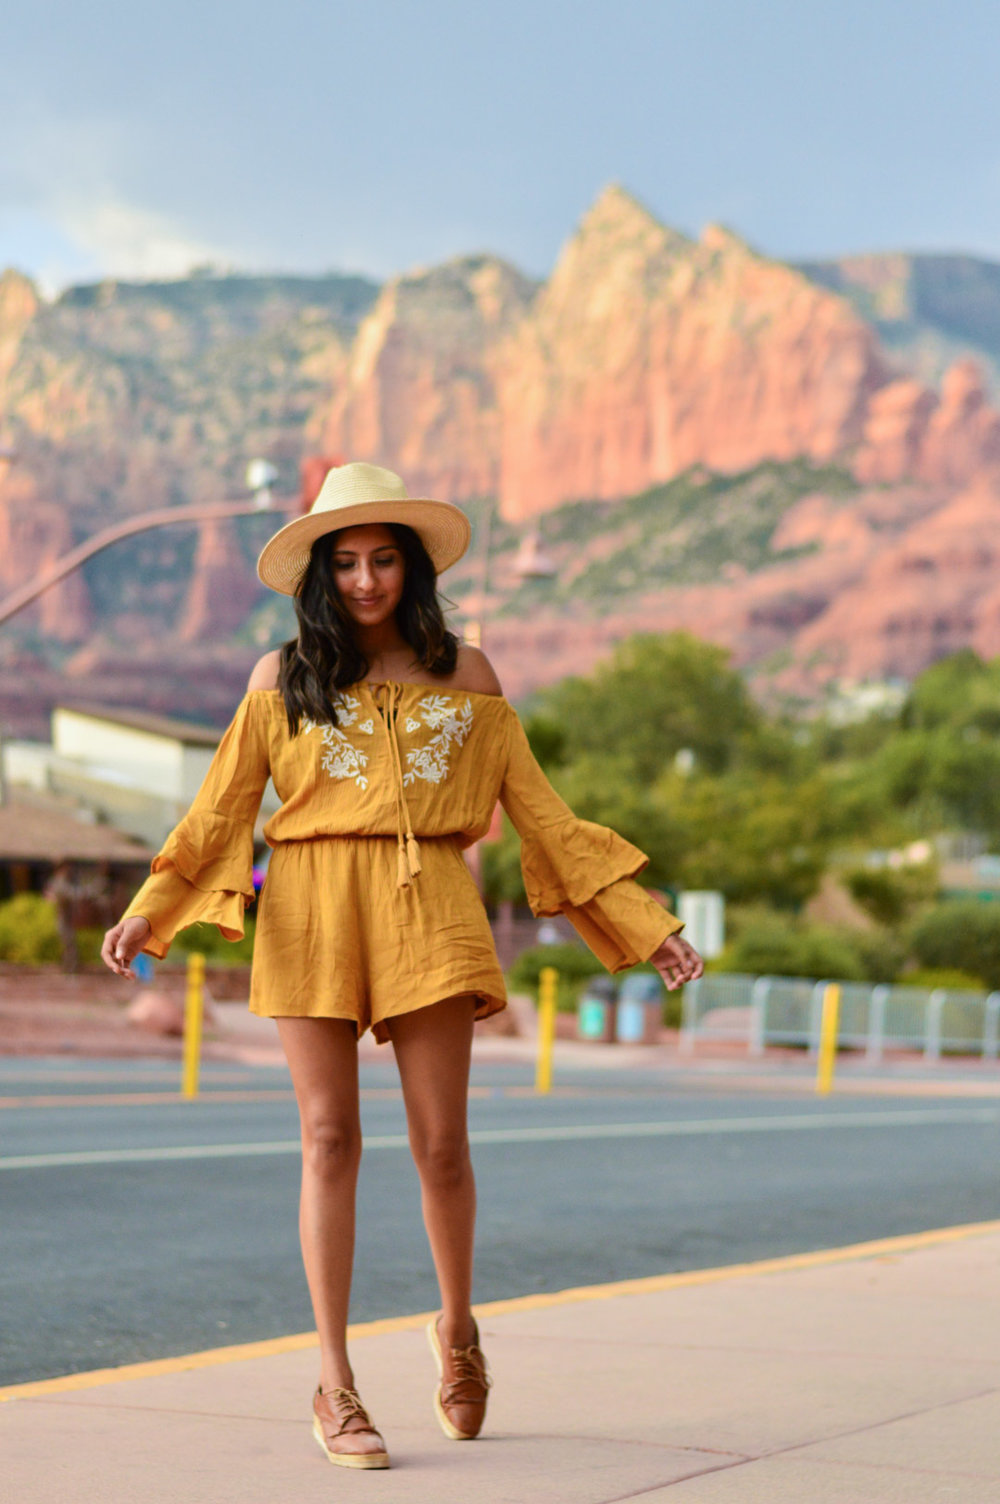 sedona-arizona-mustard-yellow-marigold-romper-travel-blogger-outfit 8